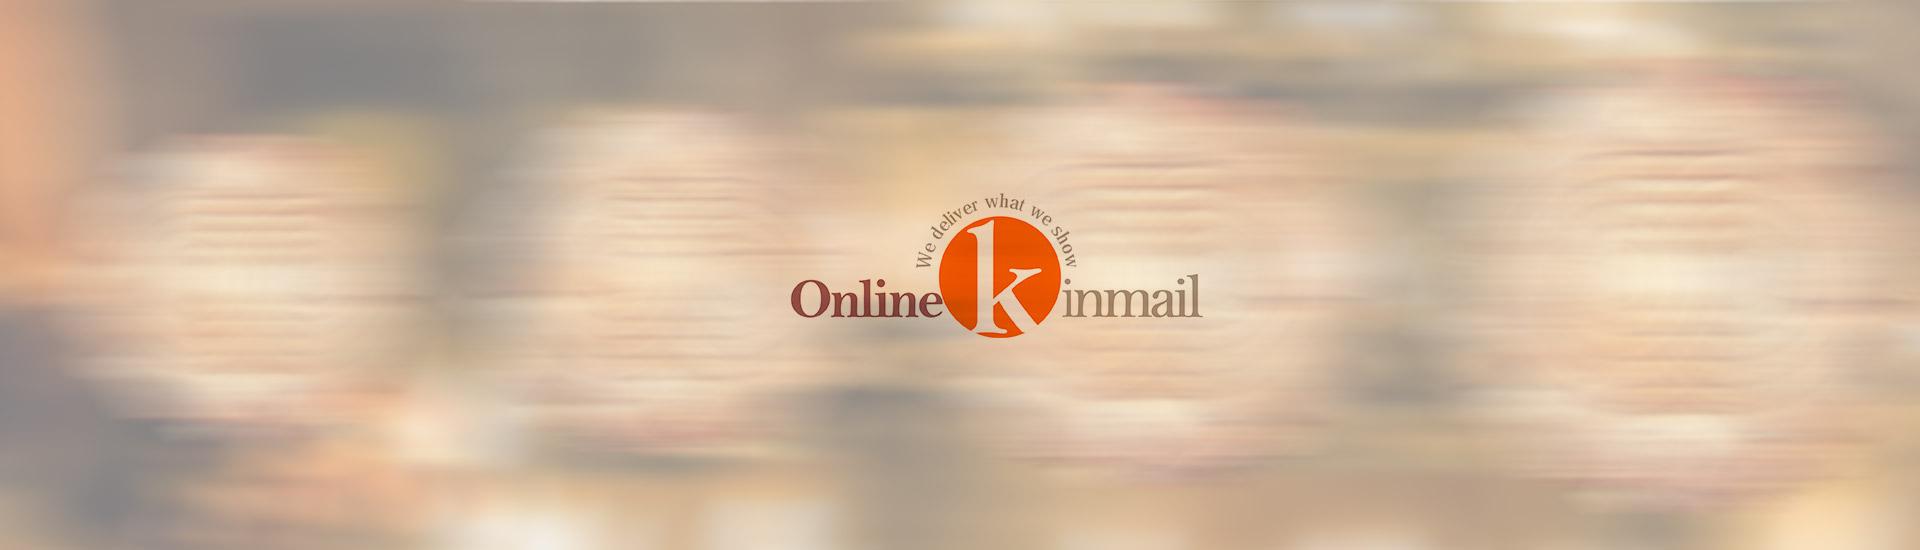 Online Kinmail